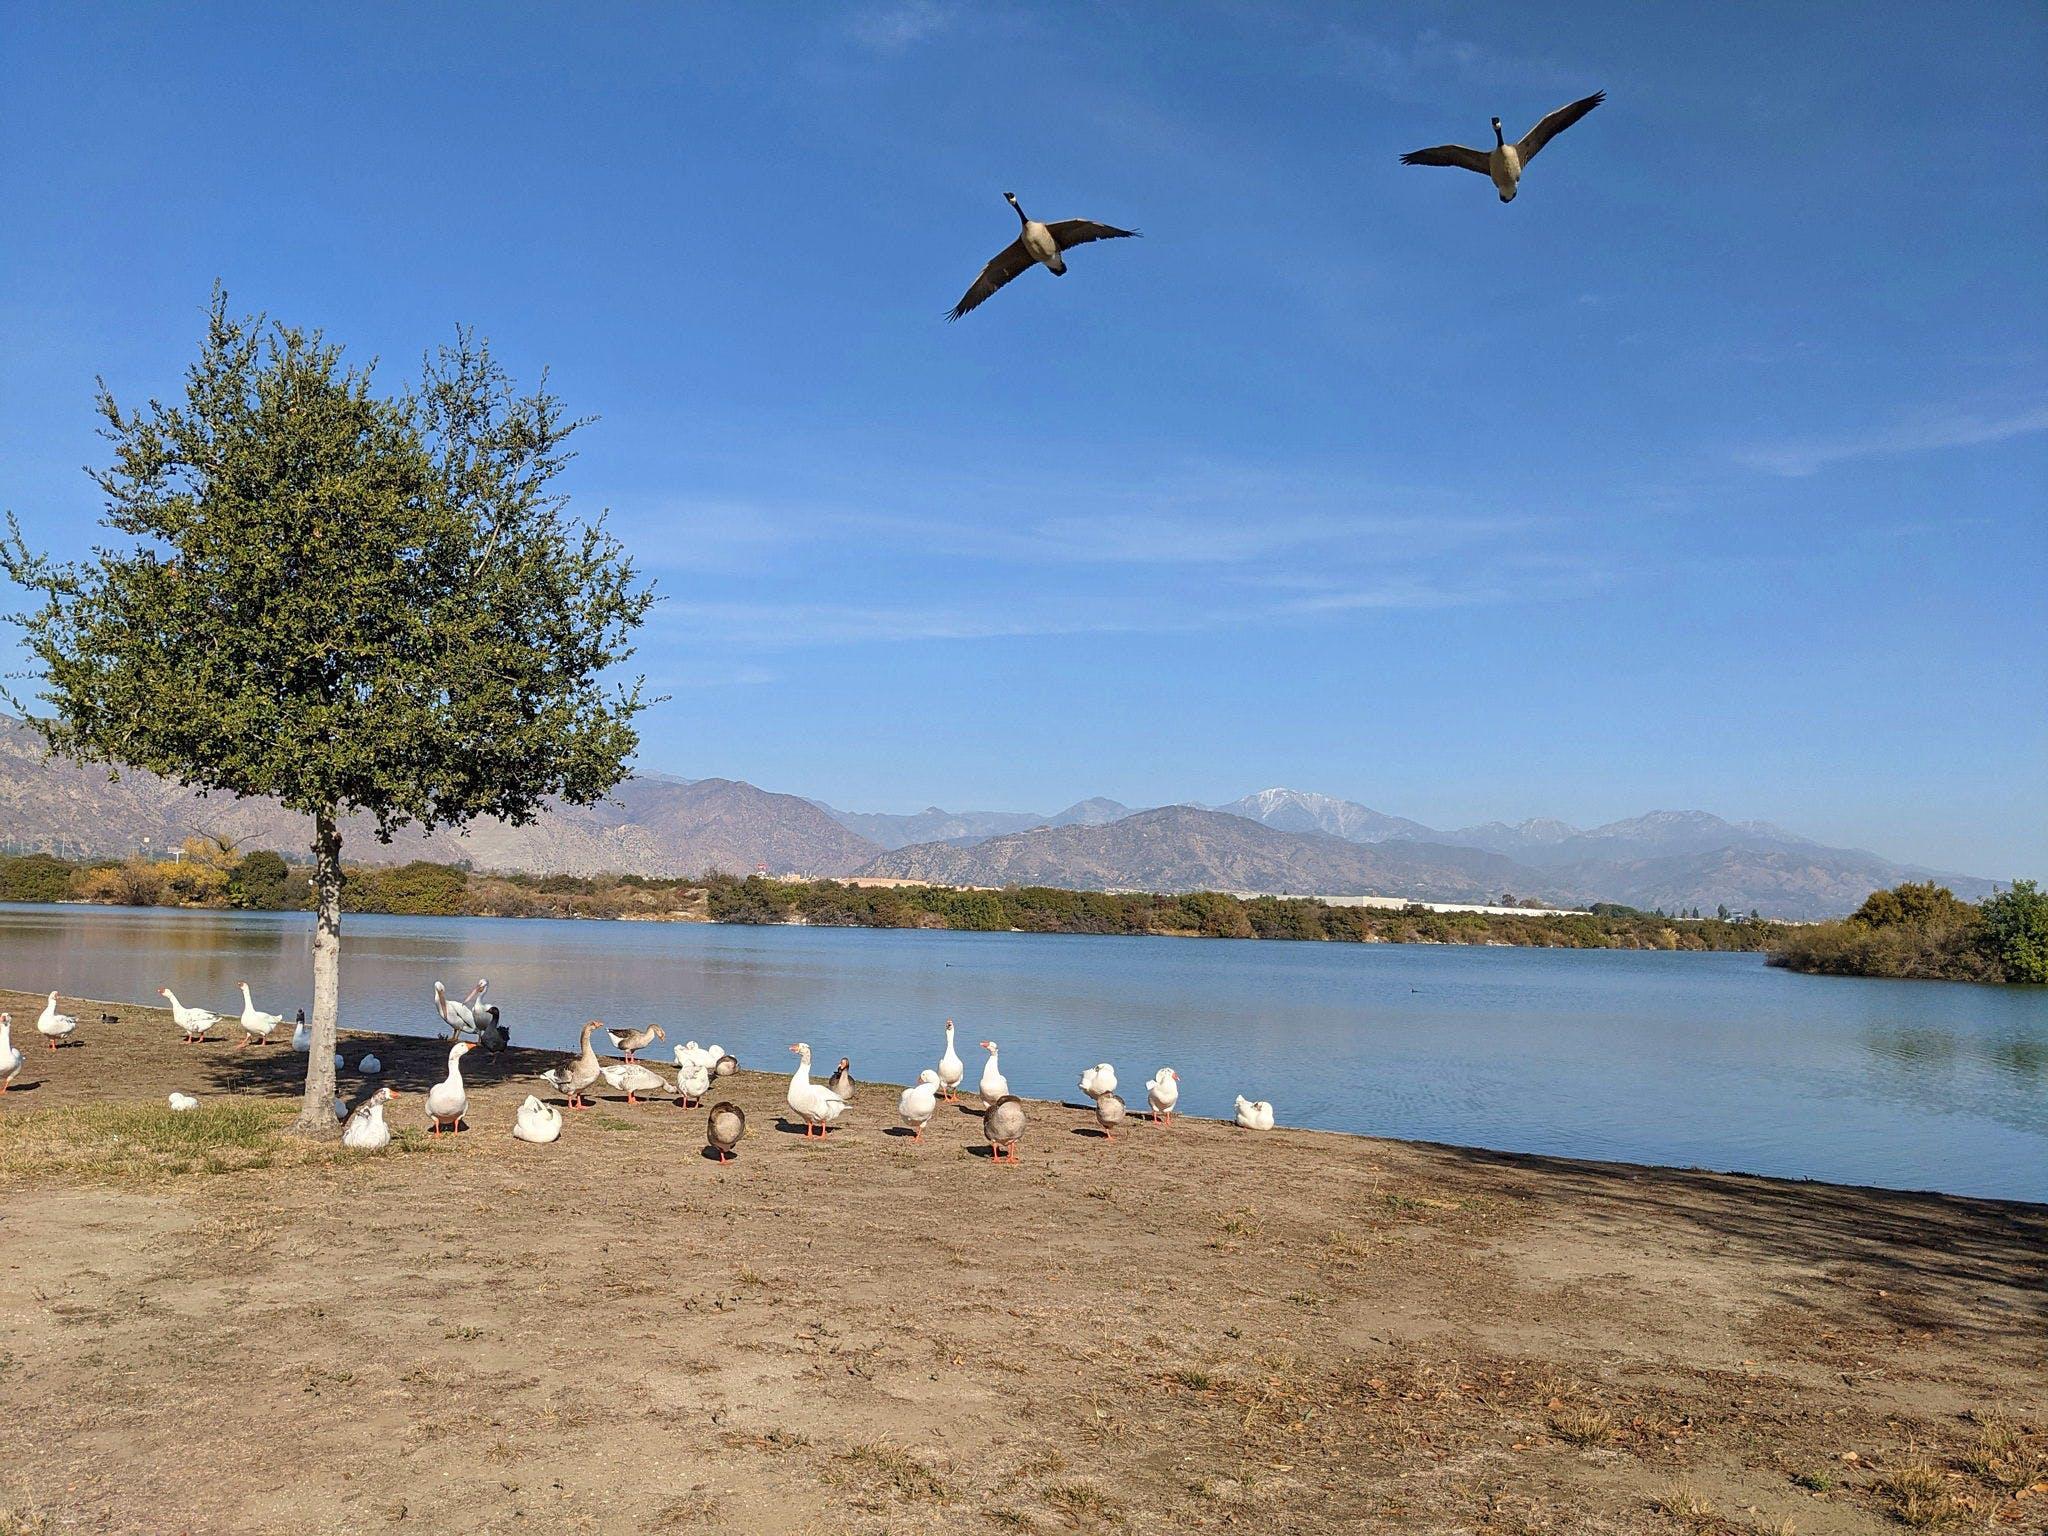 Canada Geese at the shoreline of Santa Fe Dam Recreation Area in Los Angeles County